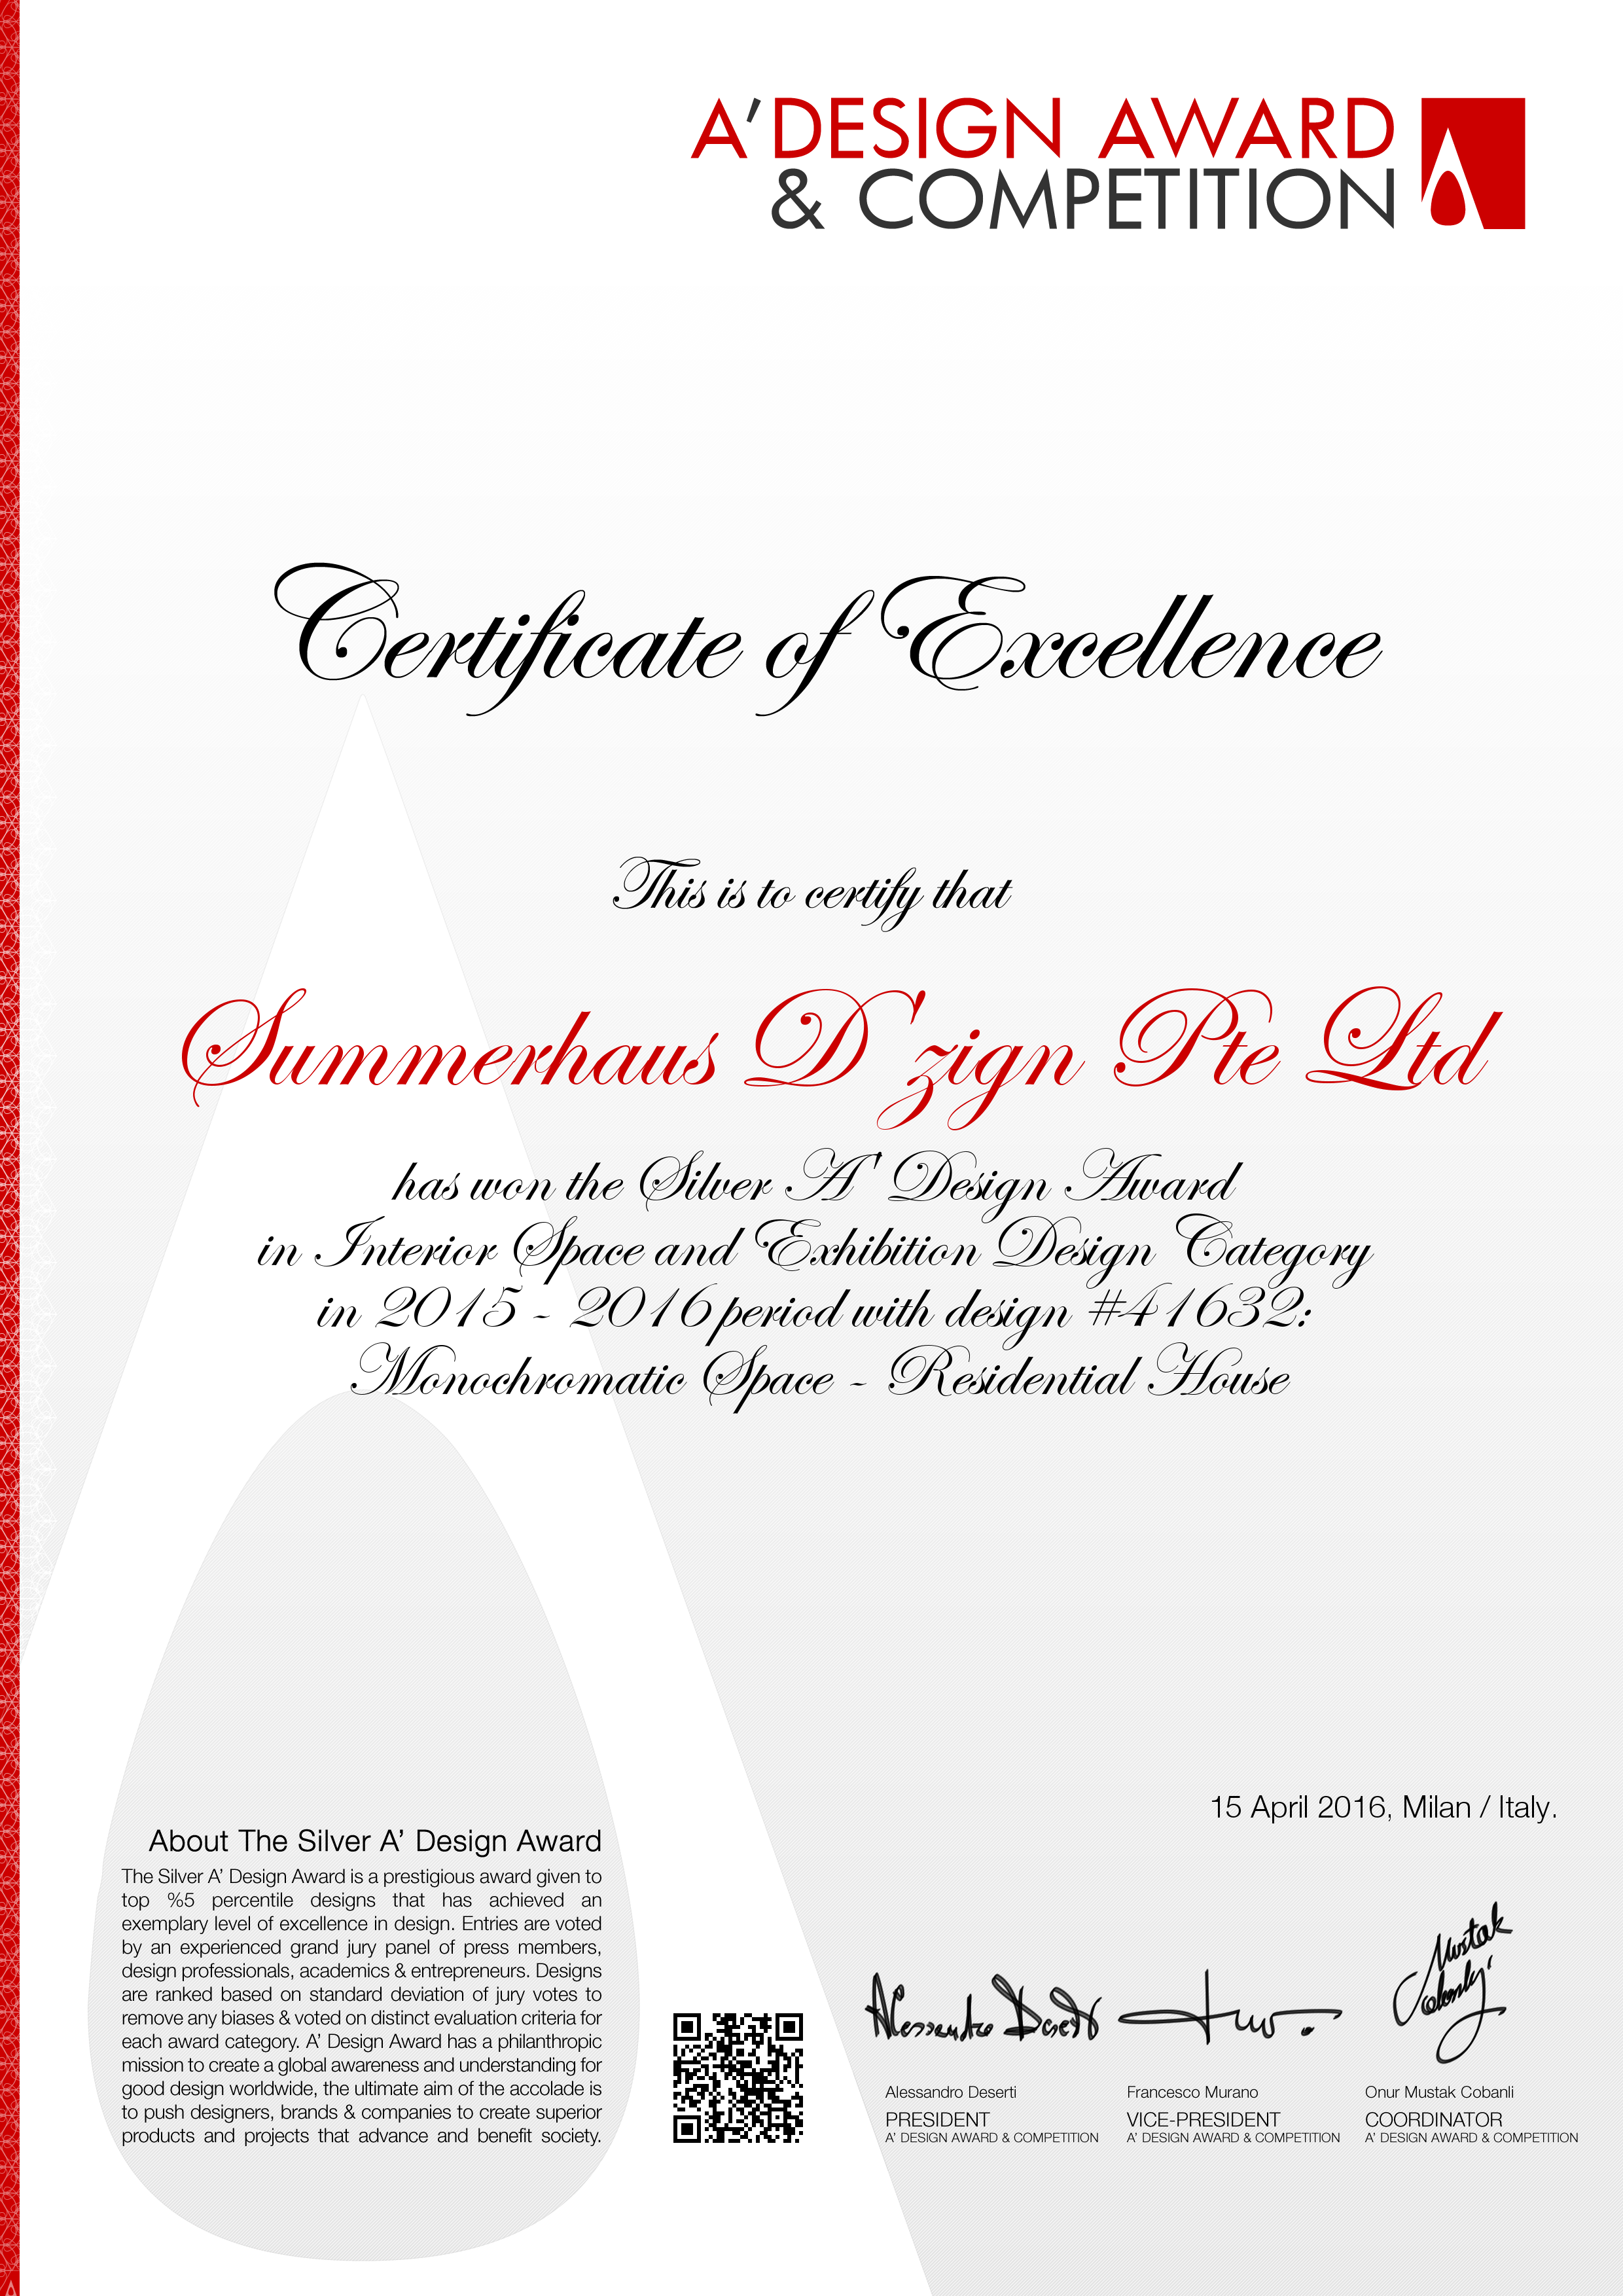 2015 A' Design Award - Silver.png